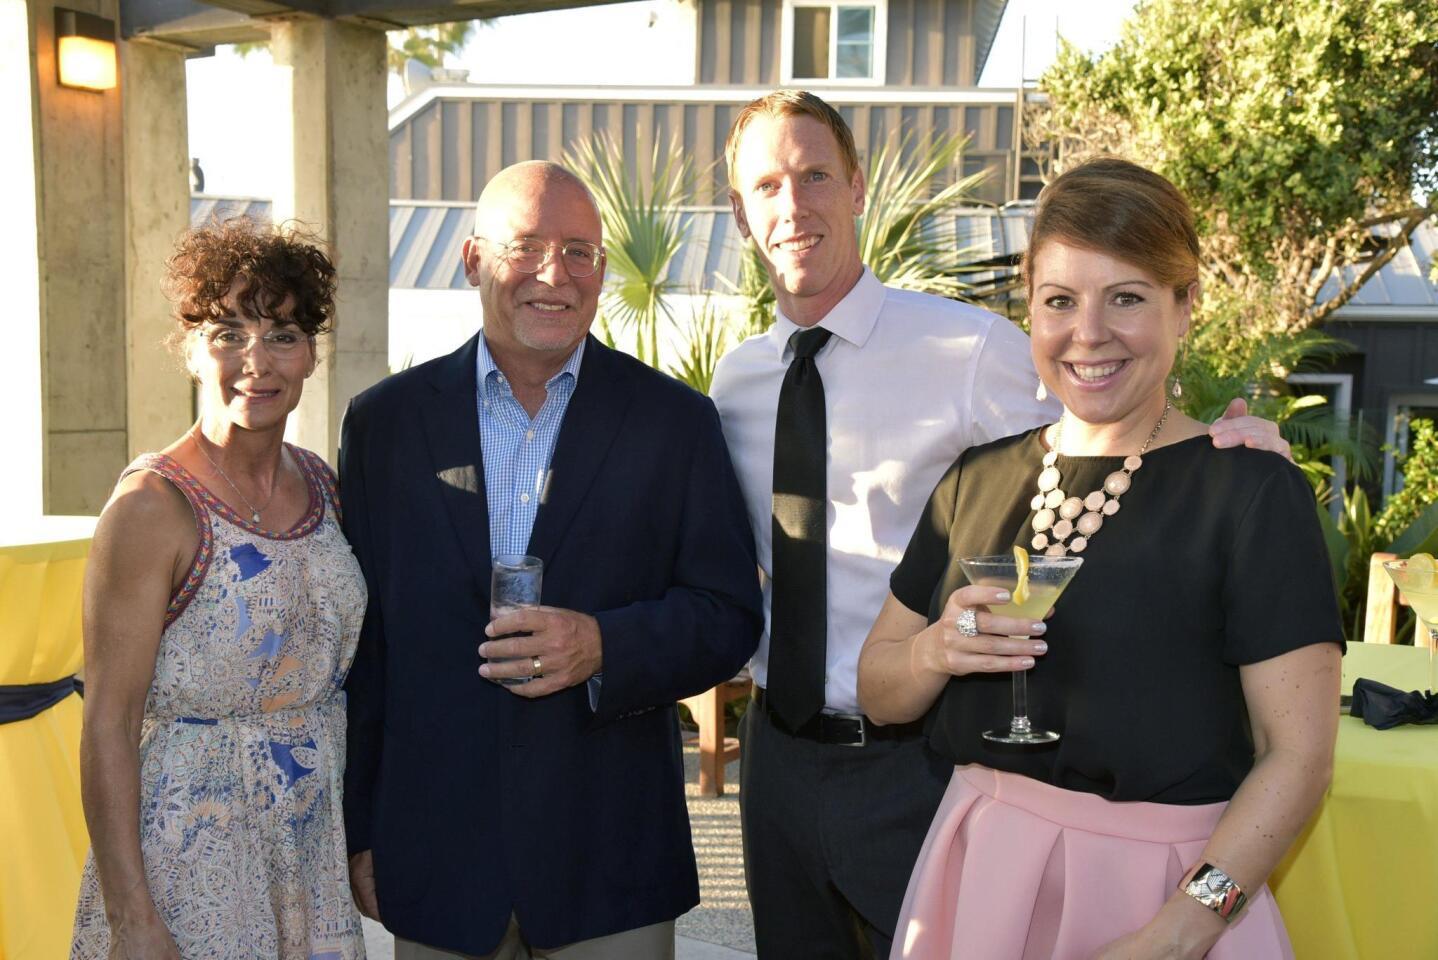 Local La La Land: Del Mar Community Connections gala benefit